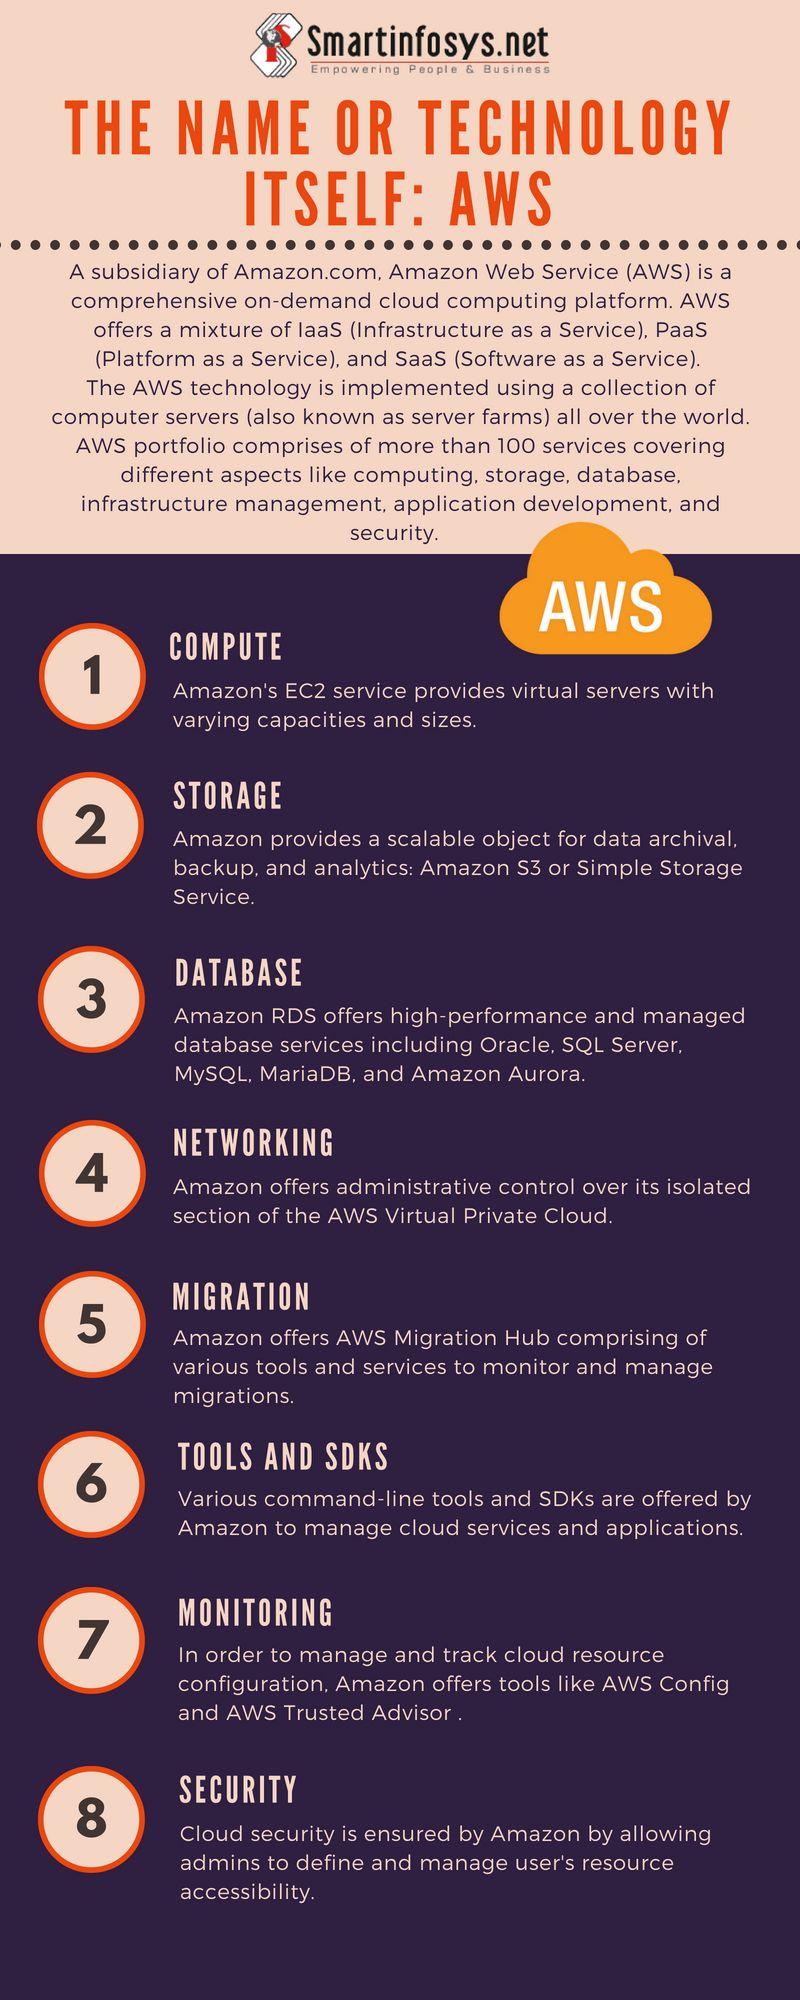 Amazon web service is a comprehensive ondemand cloud